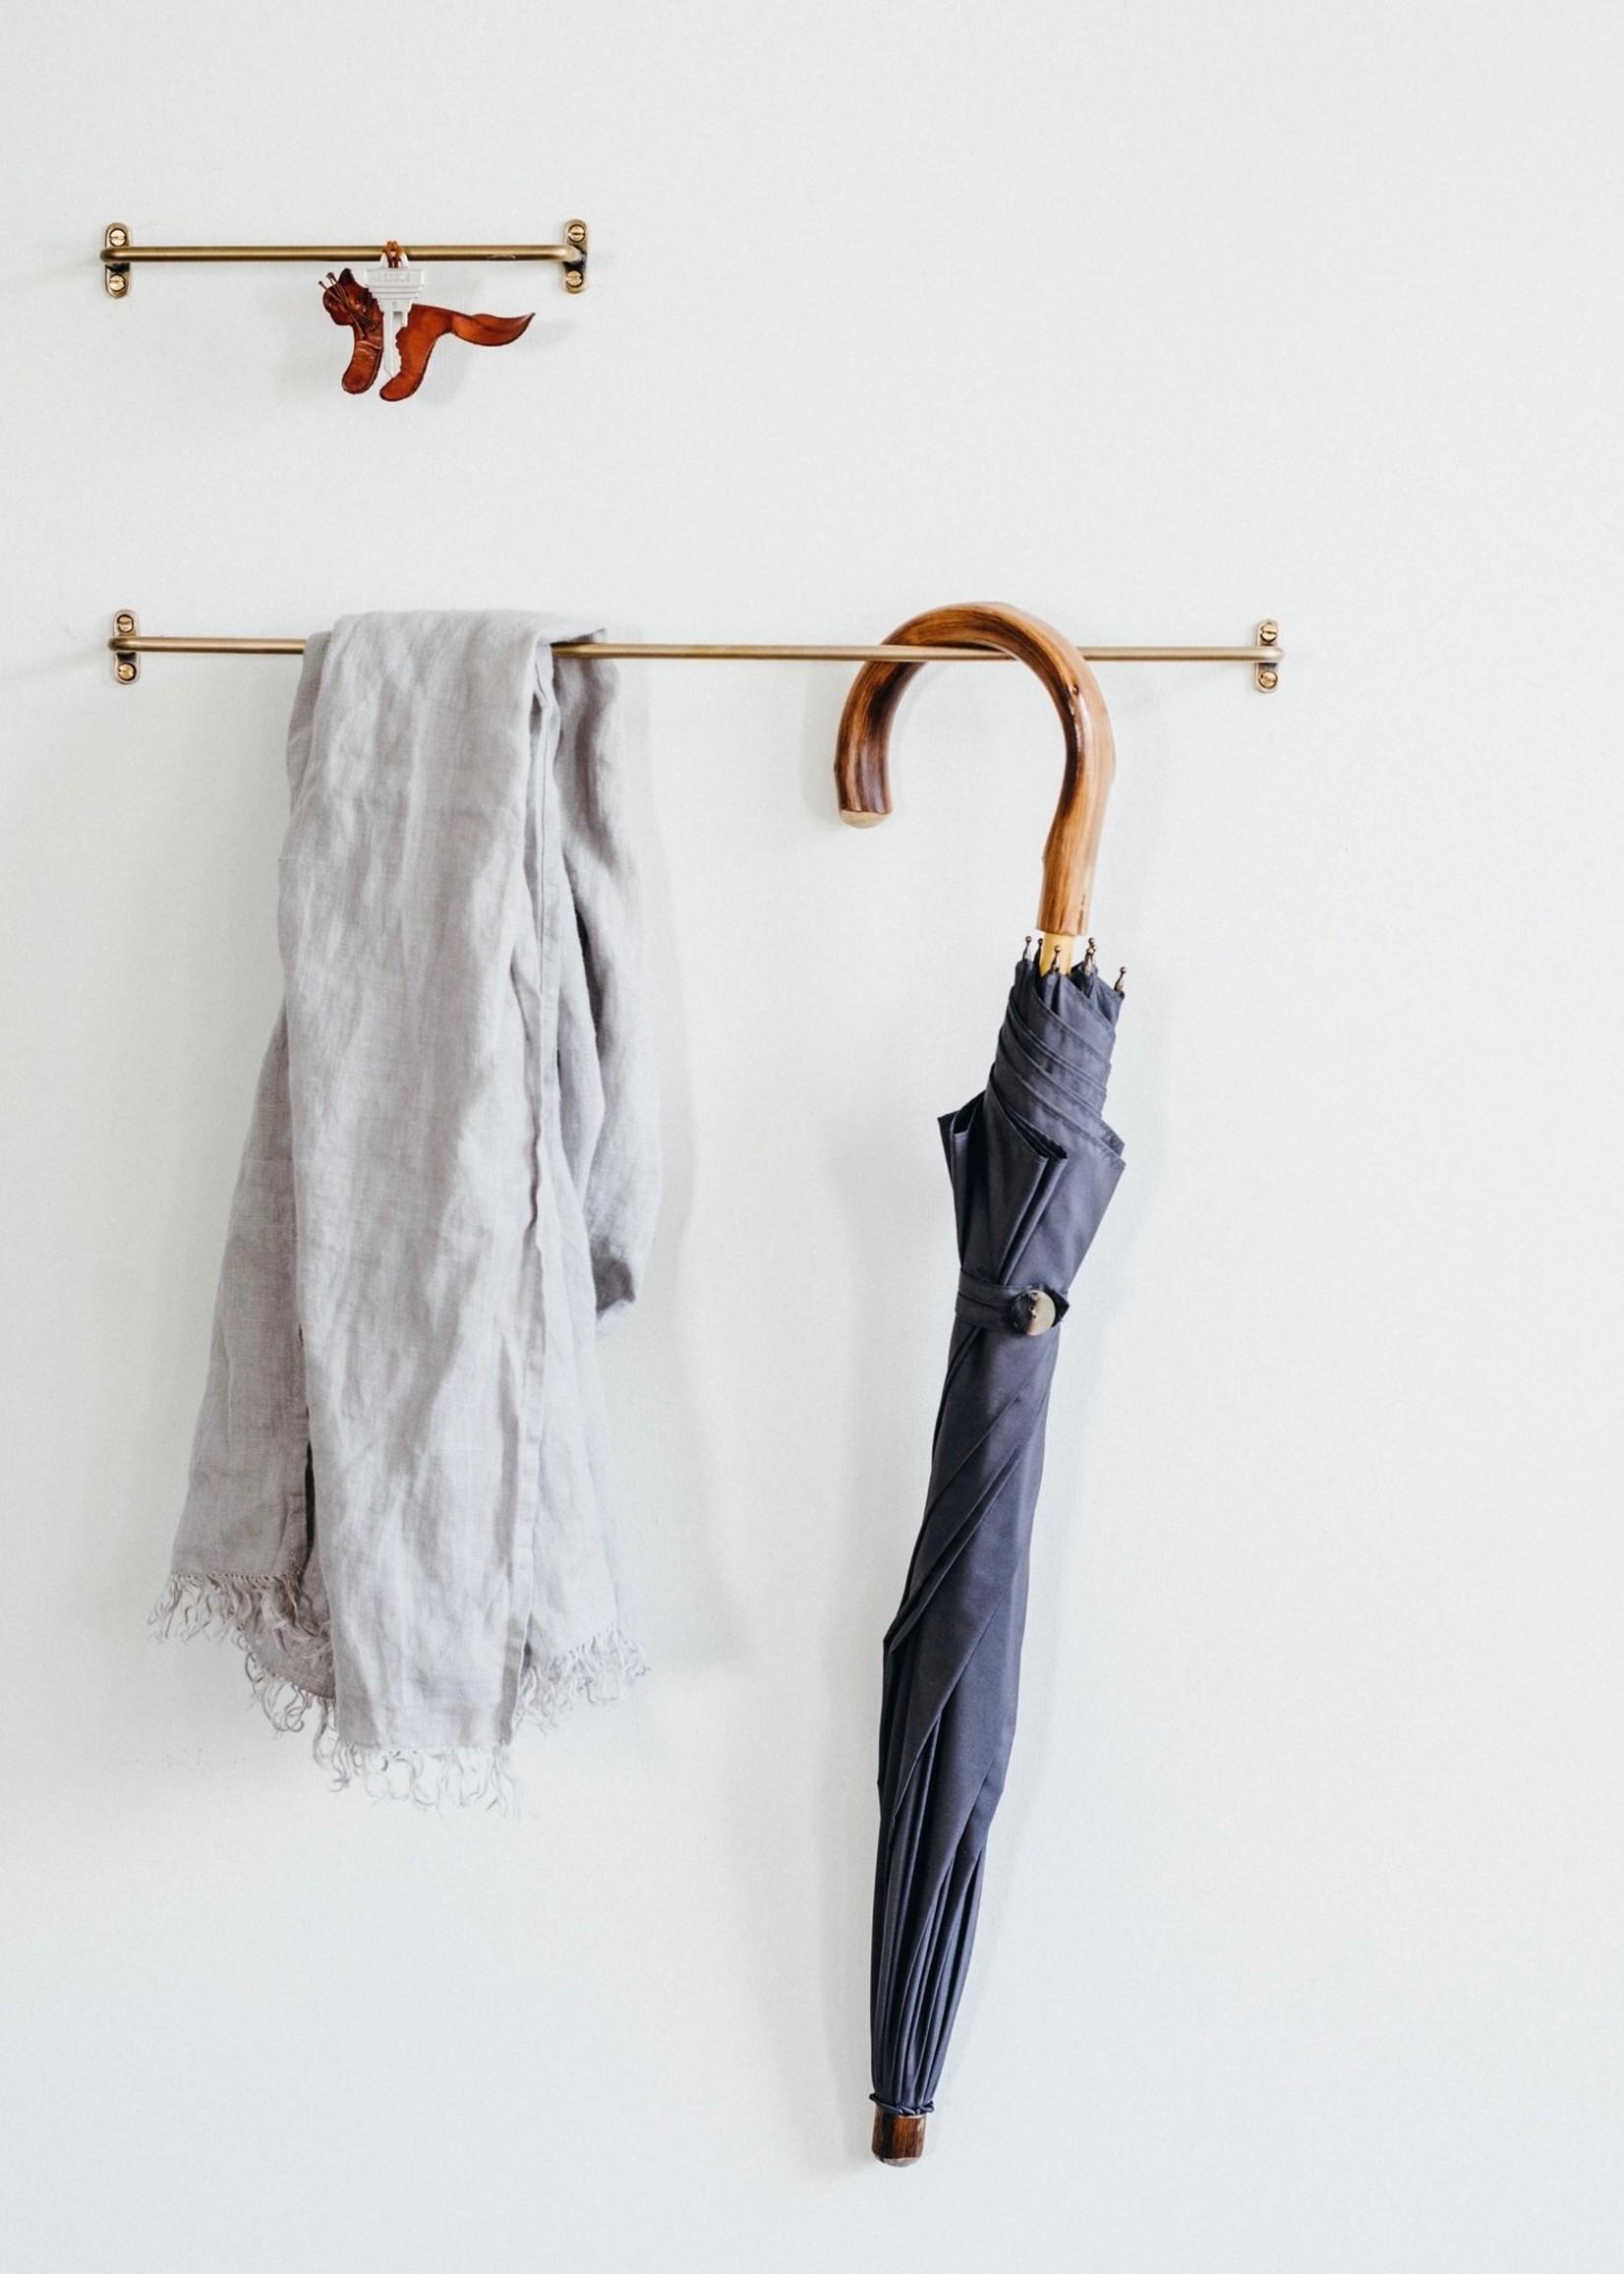 Handdoek stang - small